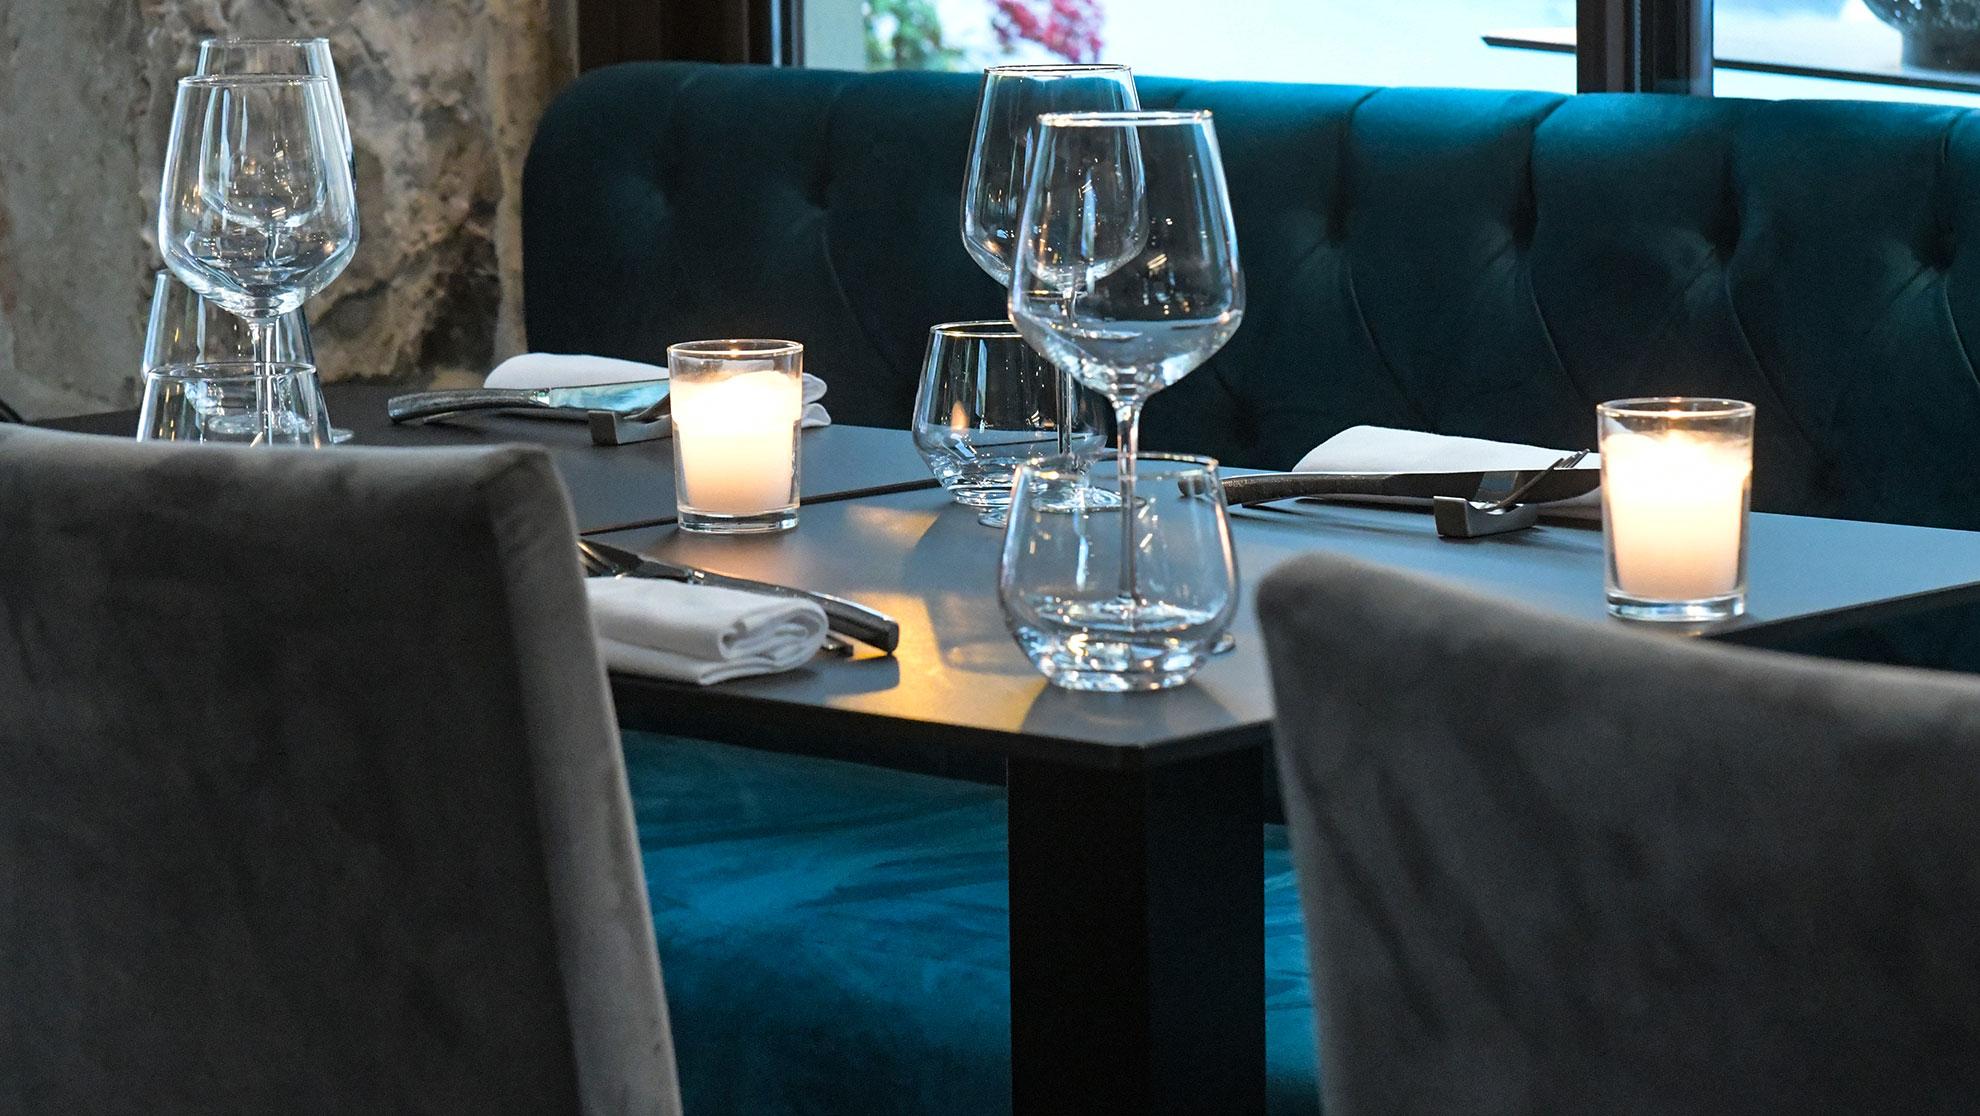 Marcello Montecarlo restaurant